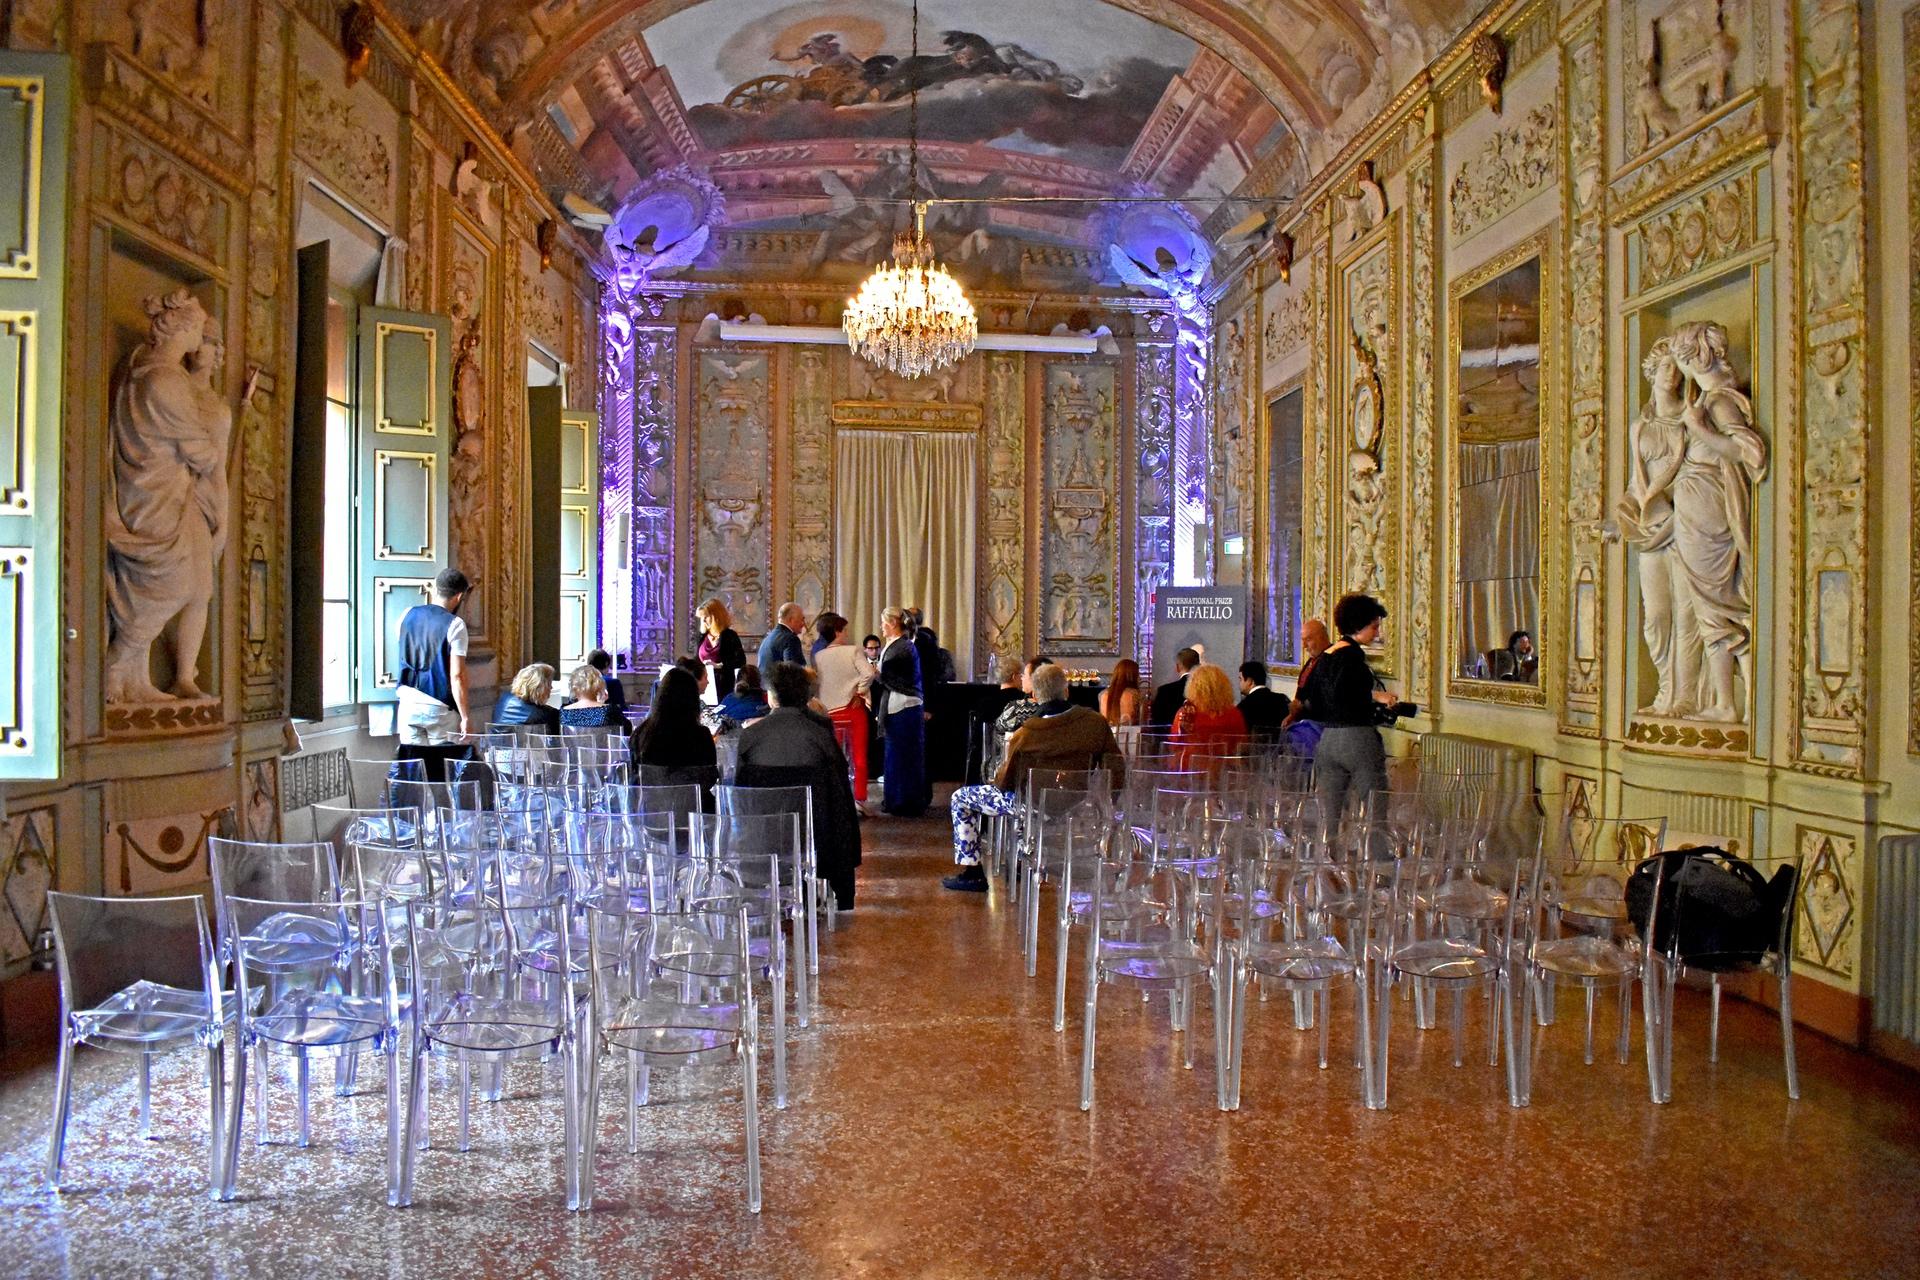 International Art Prize Raffaello 2018 Ceremony - Pako Campo